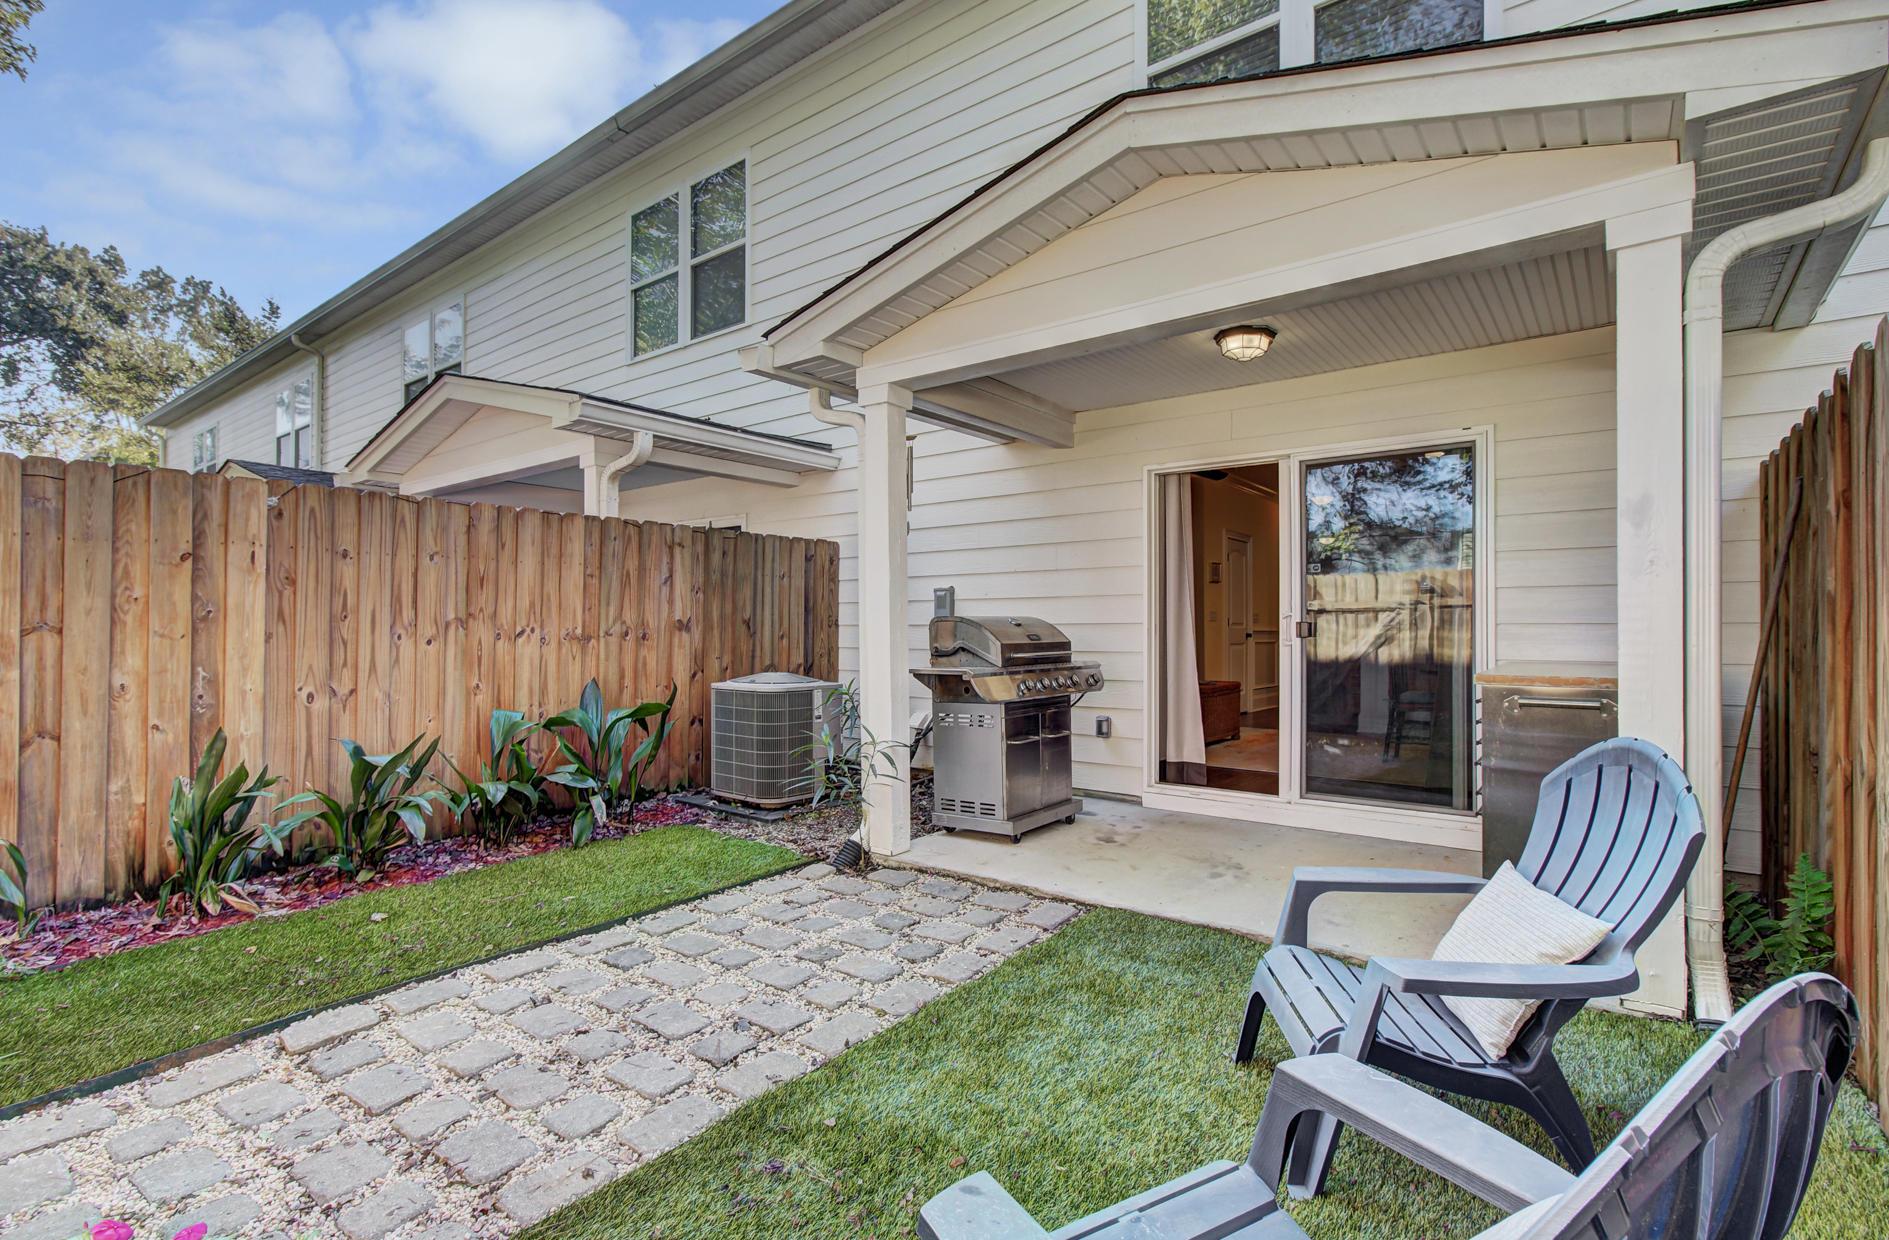 Carol Oaks Town Homes Homes For Sale - 2956 Emma, Mount Pleasant, SC - 26